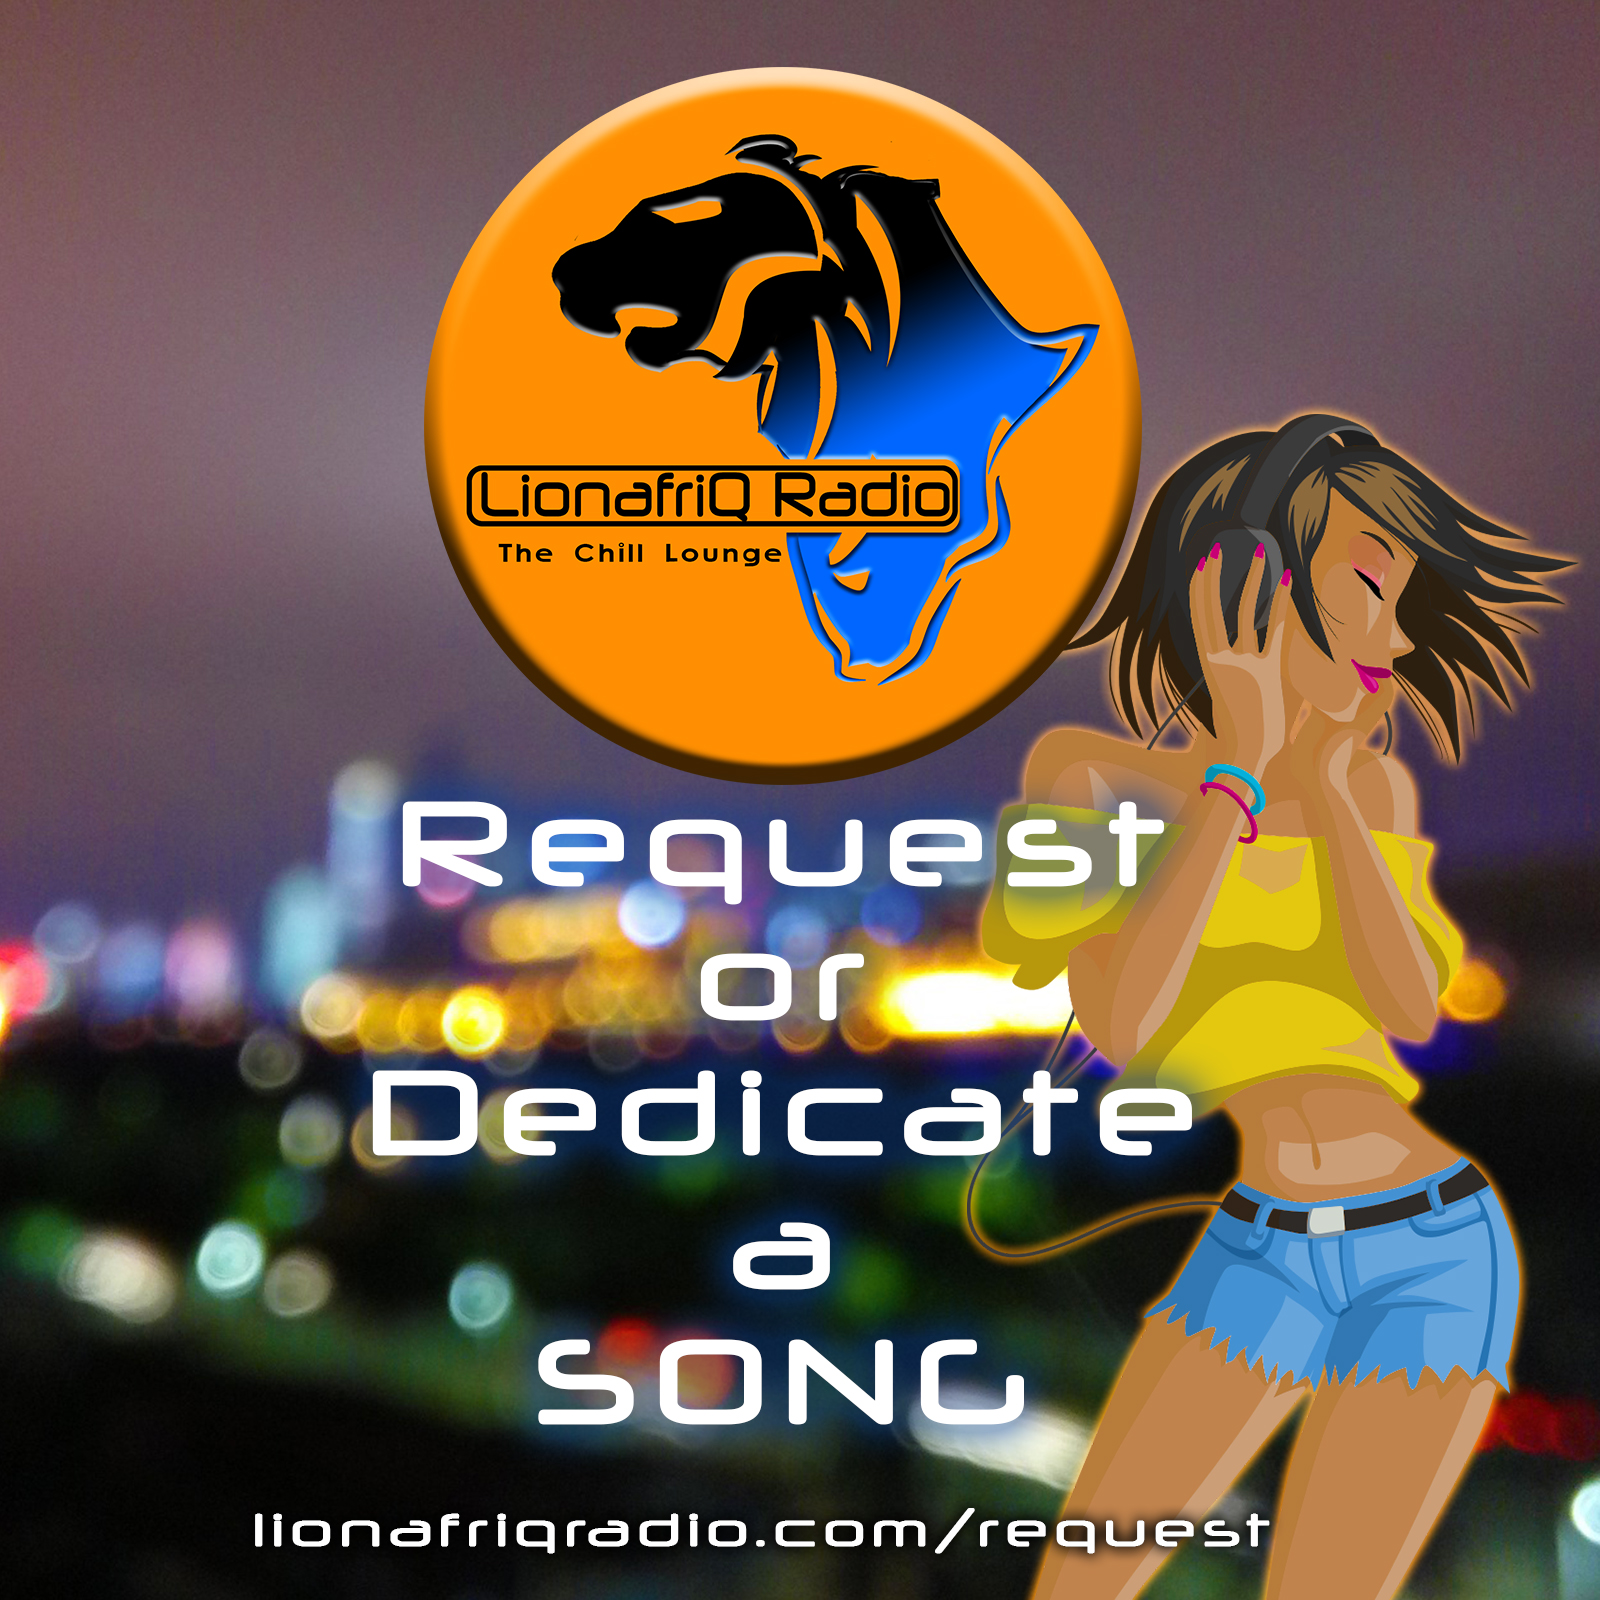 http://www.lionafriqradio.com